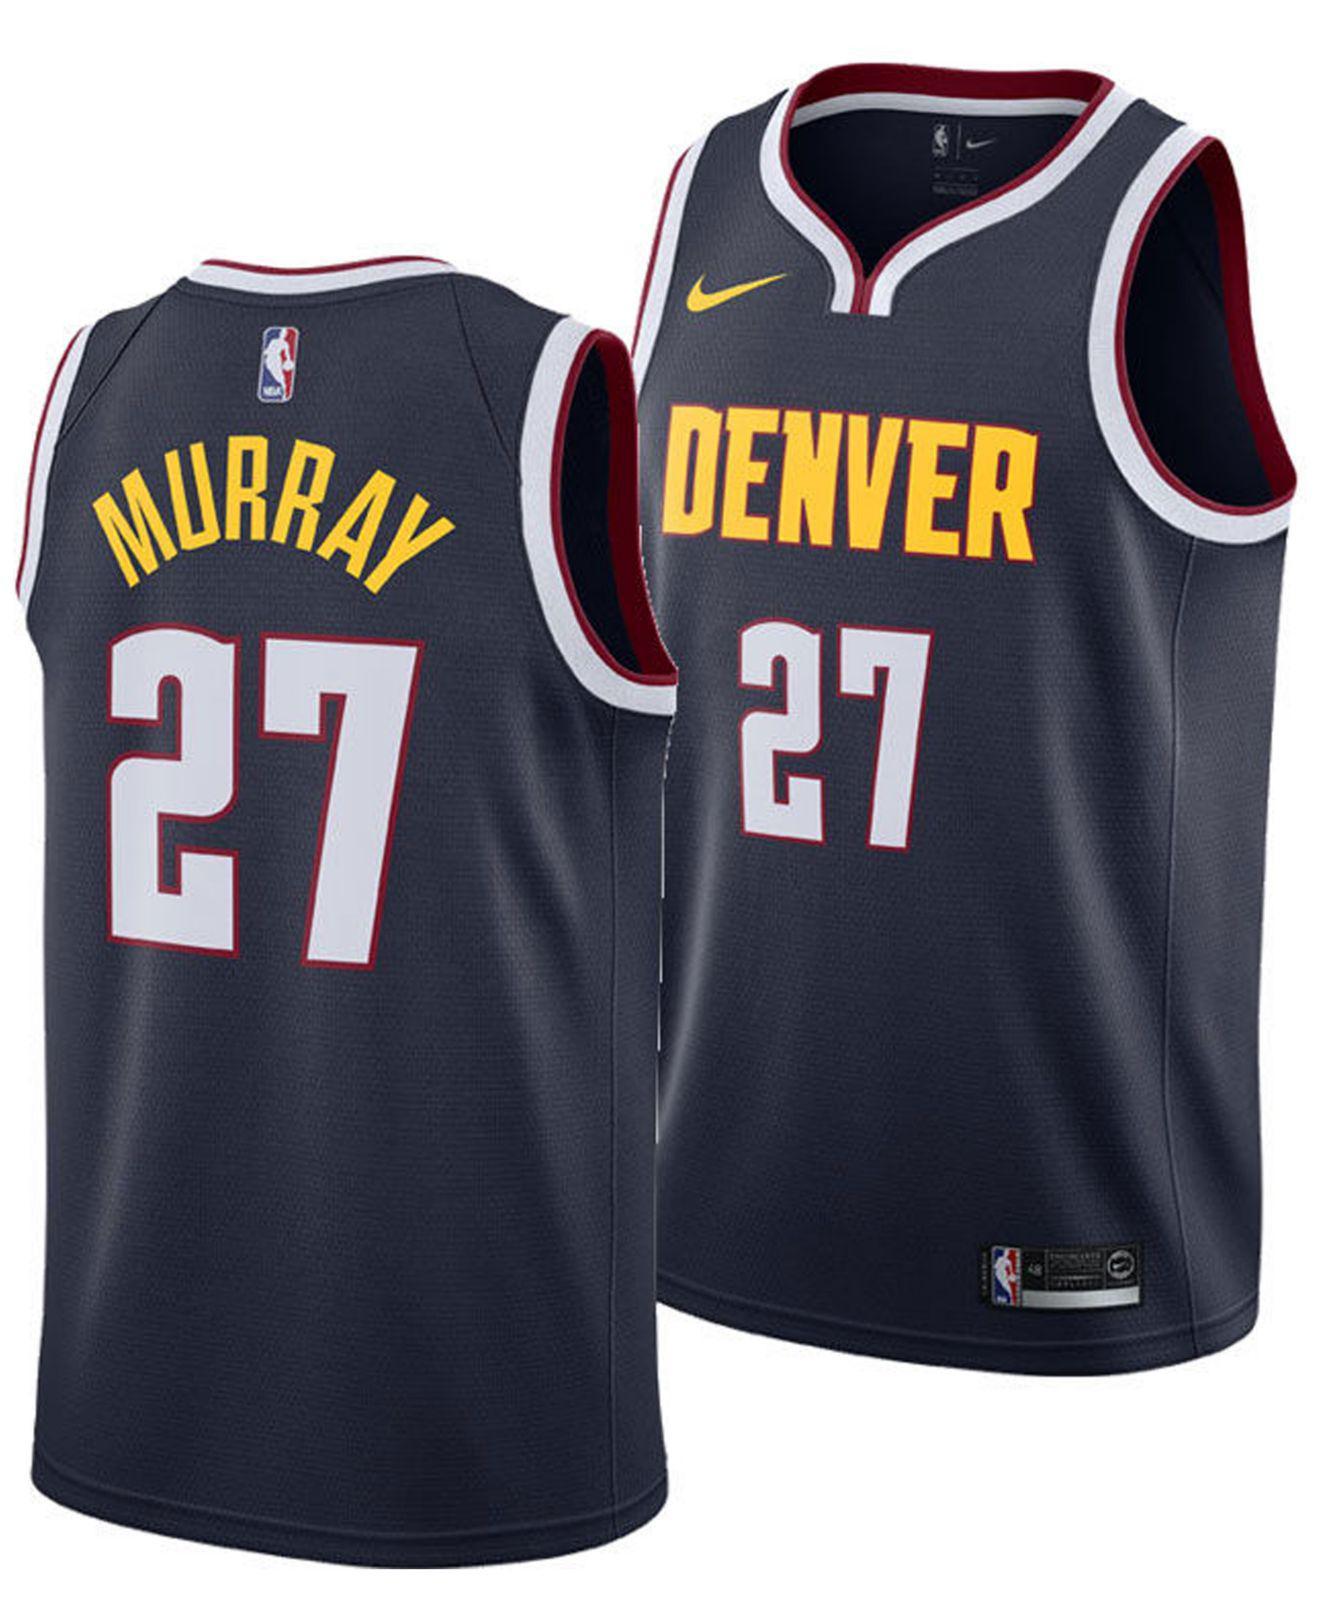 e0c170639d09 Nike - Blue Jamal Murray Denver Nuggets Icon Swingman Jersey for Men -  Lyst. View fullscreen